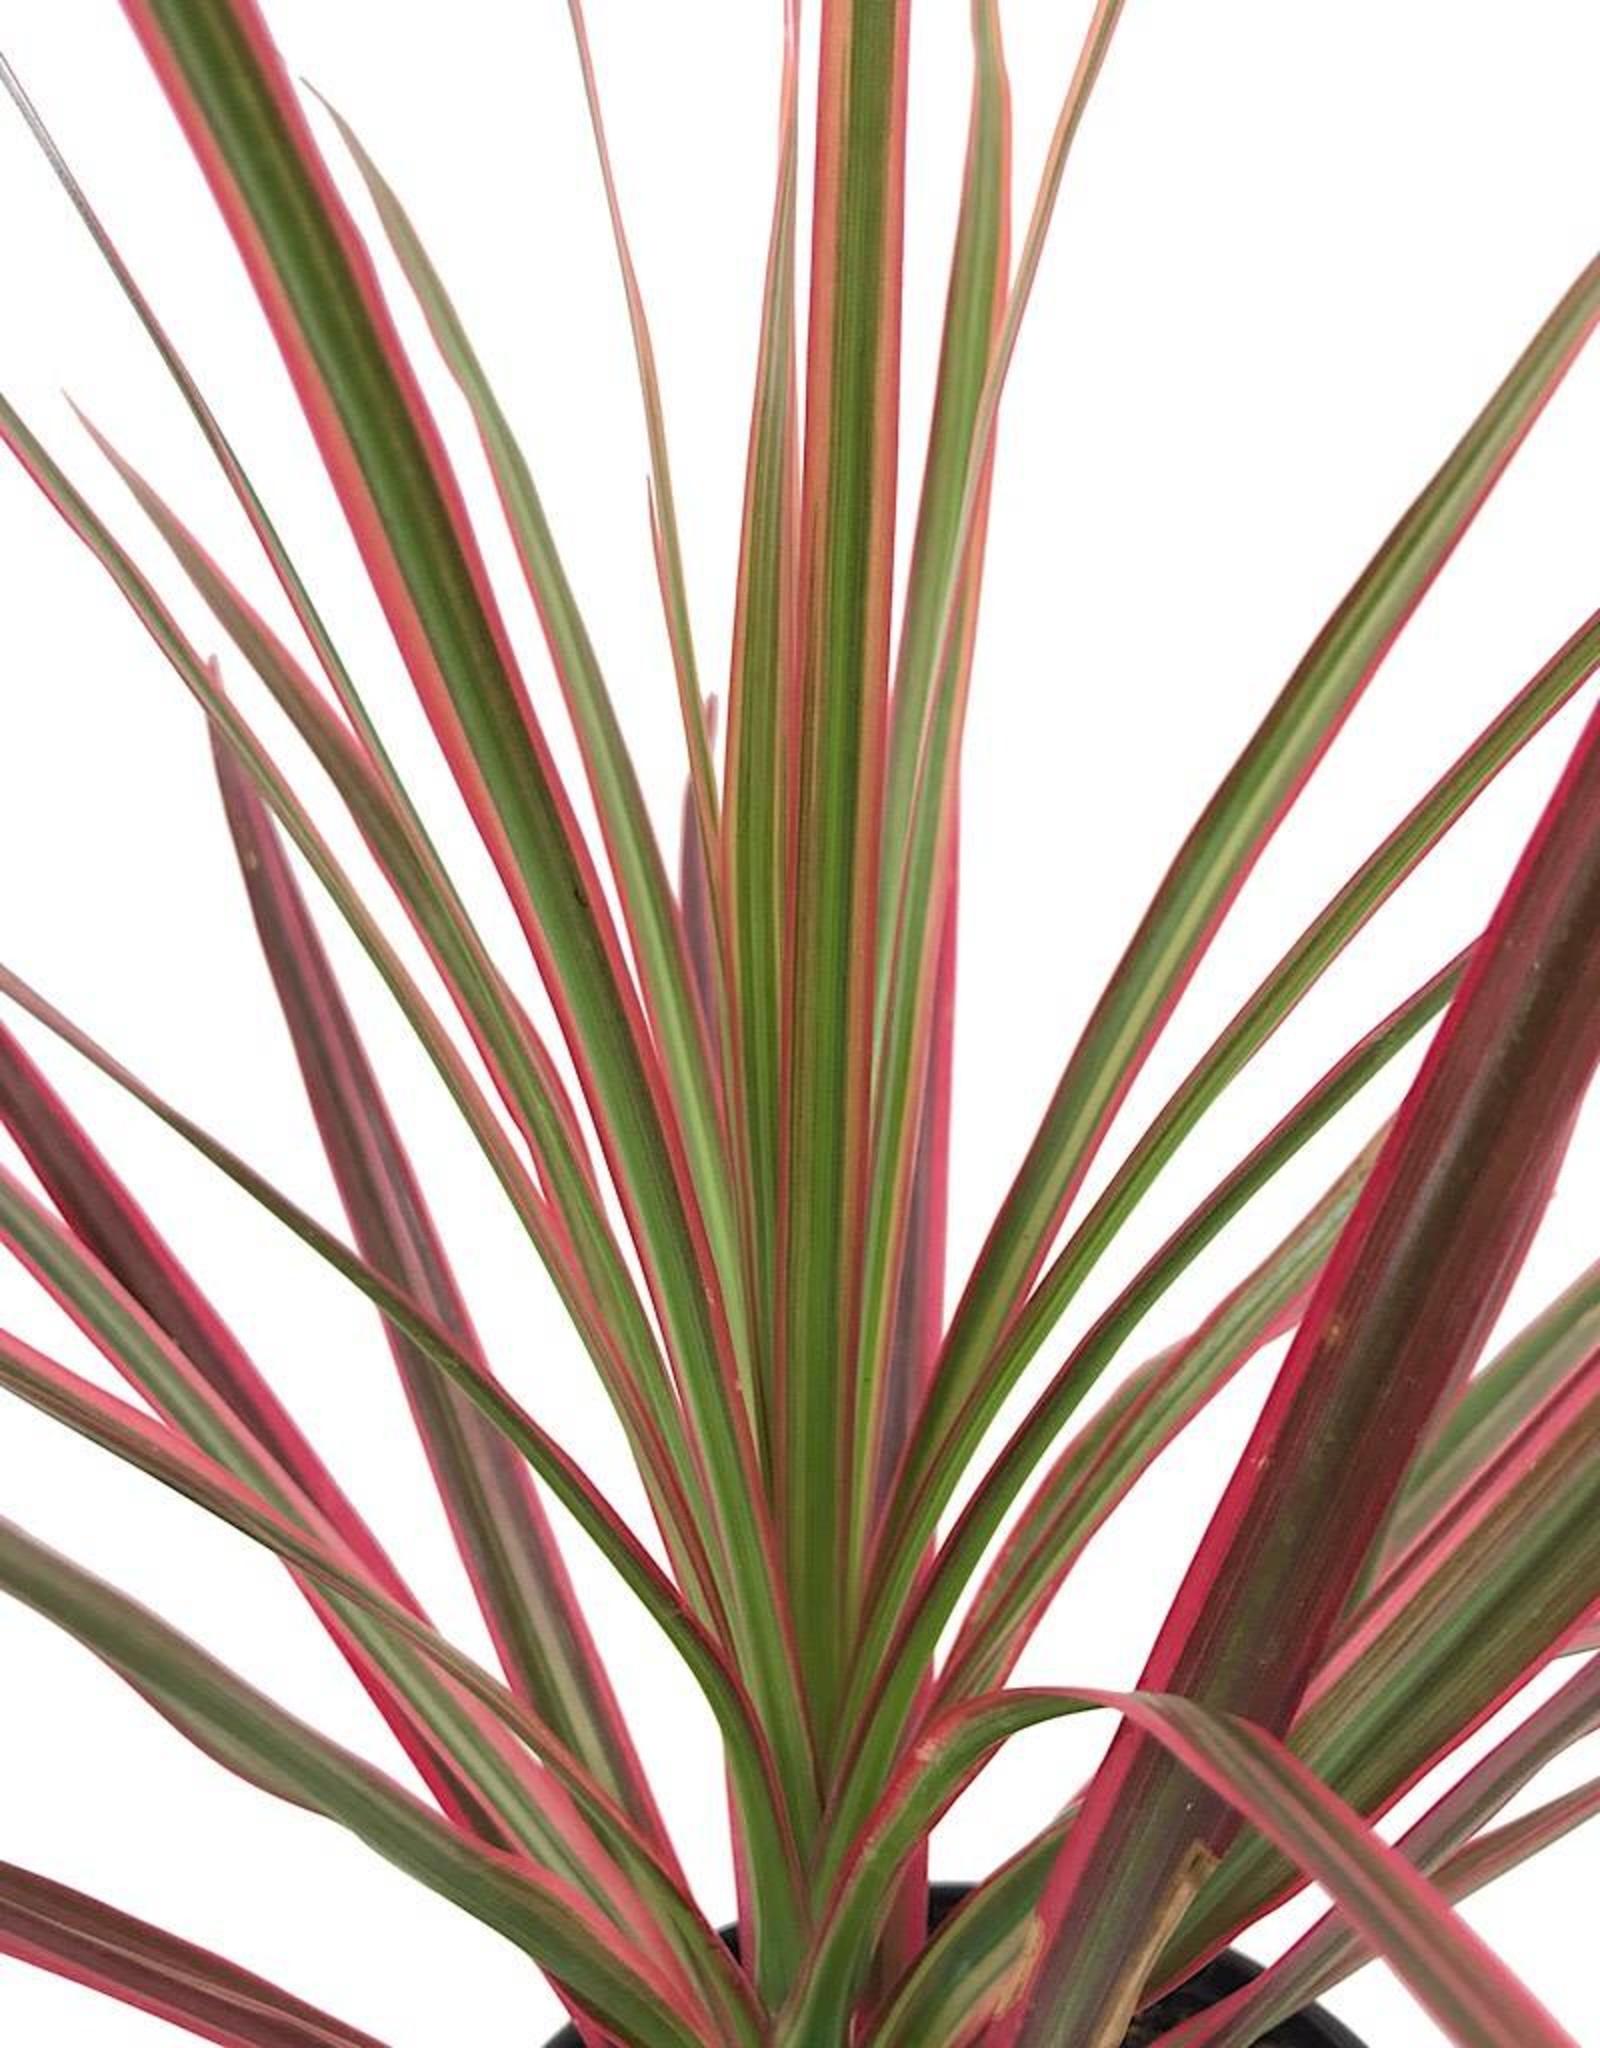 Dracaena marginata 'Colorama' 4 Inch